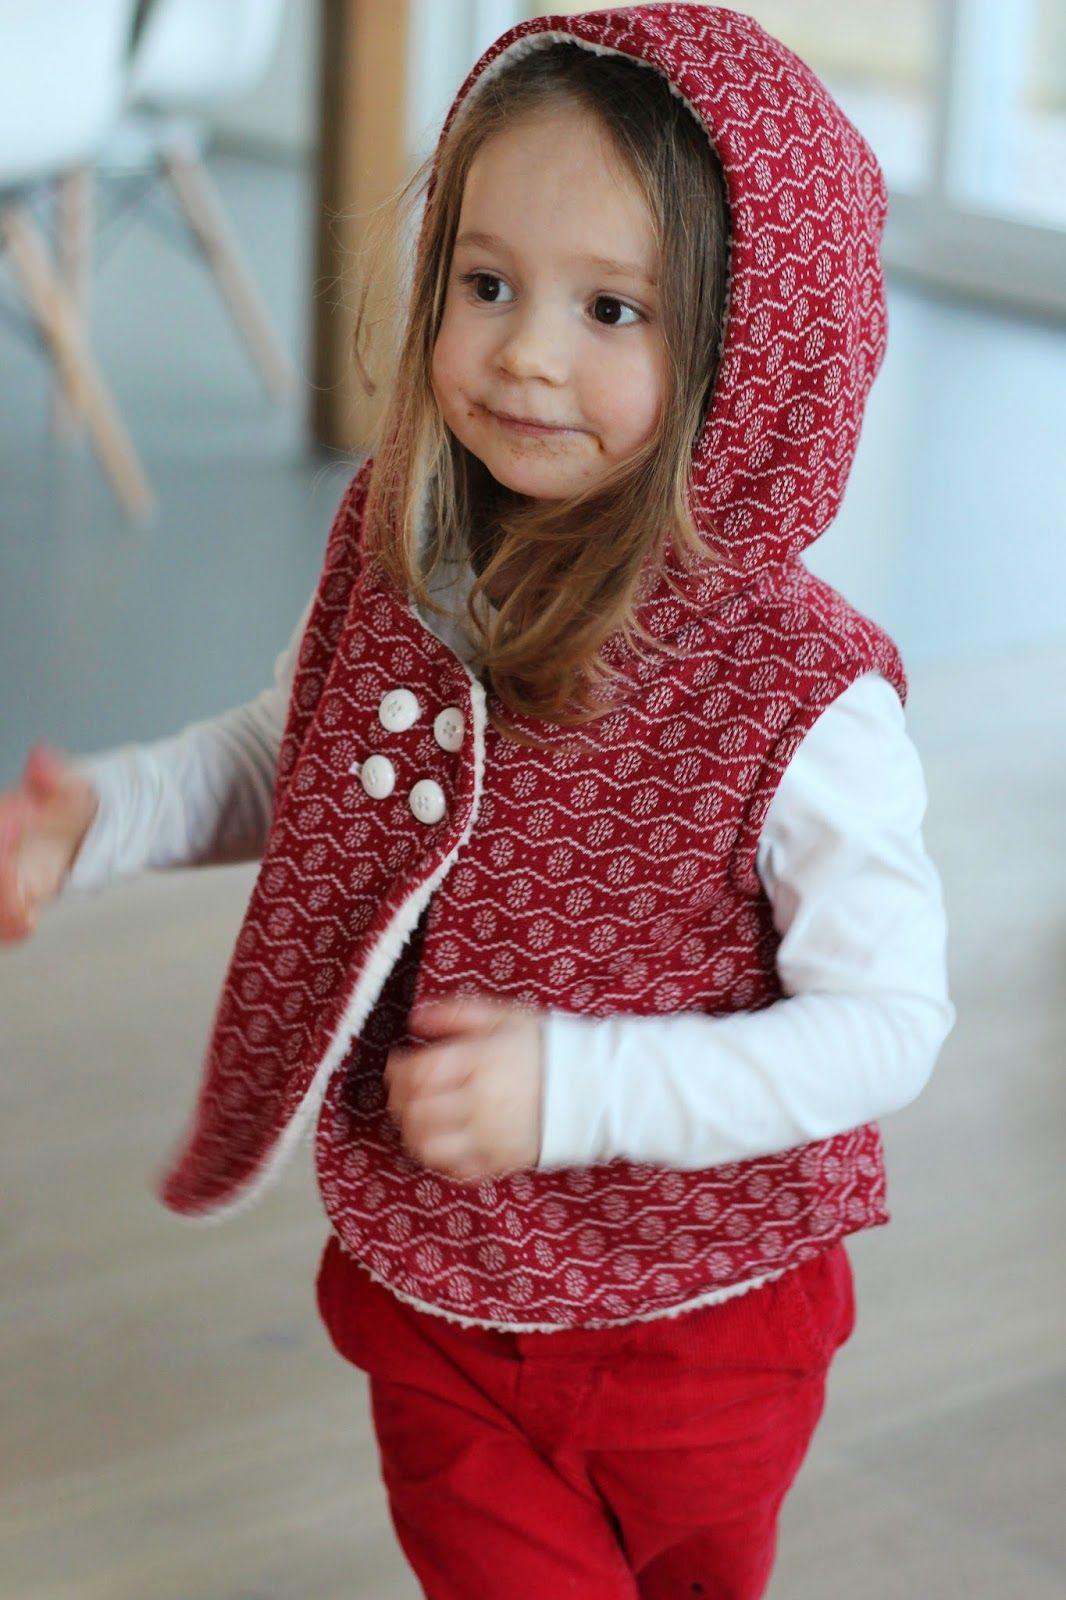 Roodkapje Little Red Riding Hood Minniemie Kinder Kleidung Kinder Klamotten Kinderkleidung